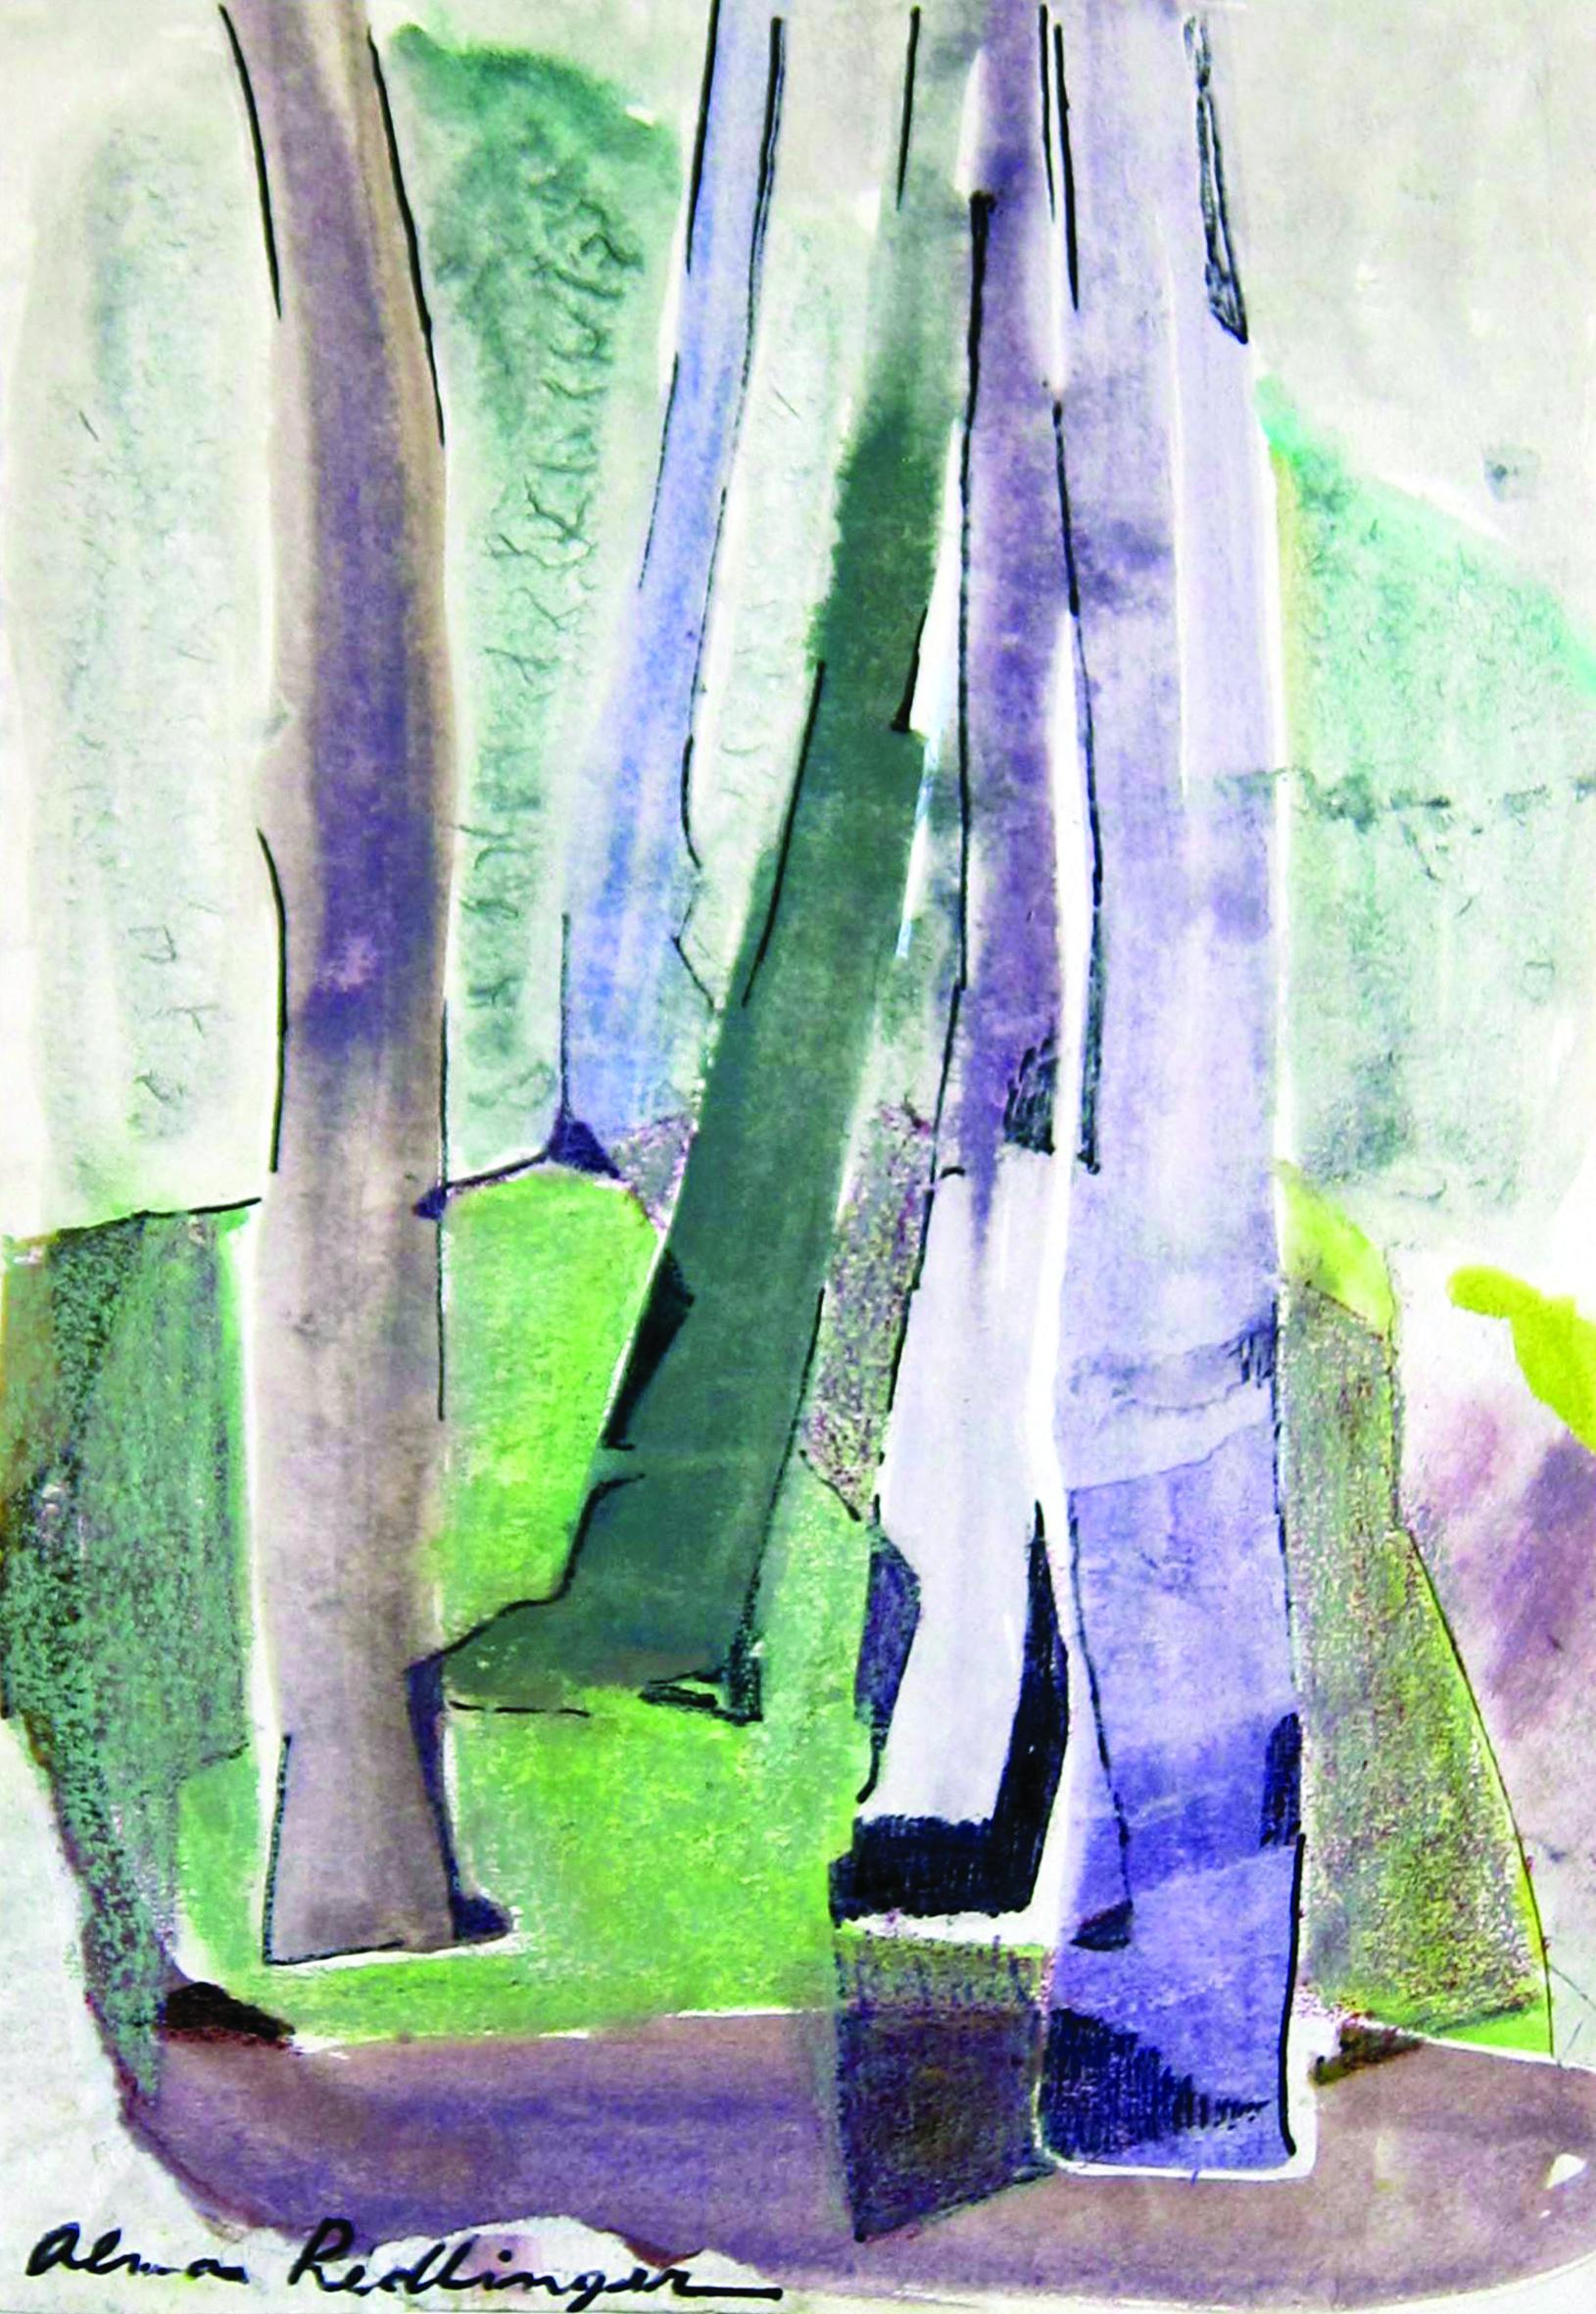 Violet trees, 1983, watercolor, 39X27 cm